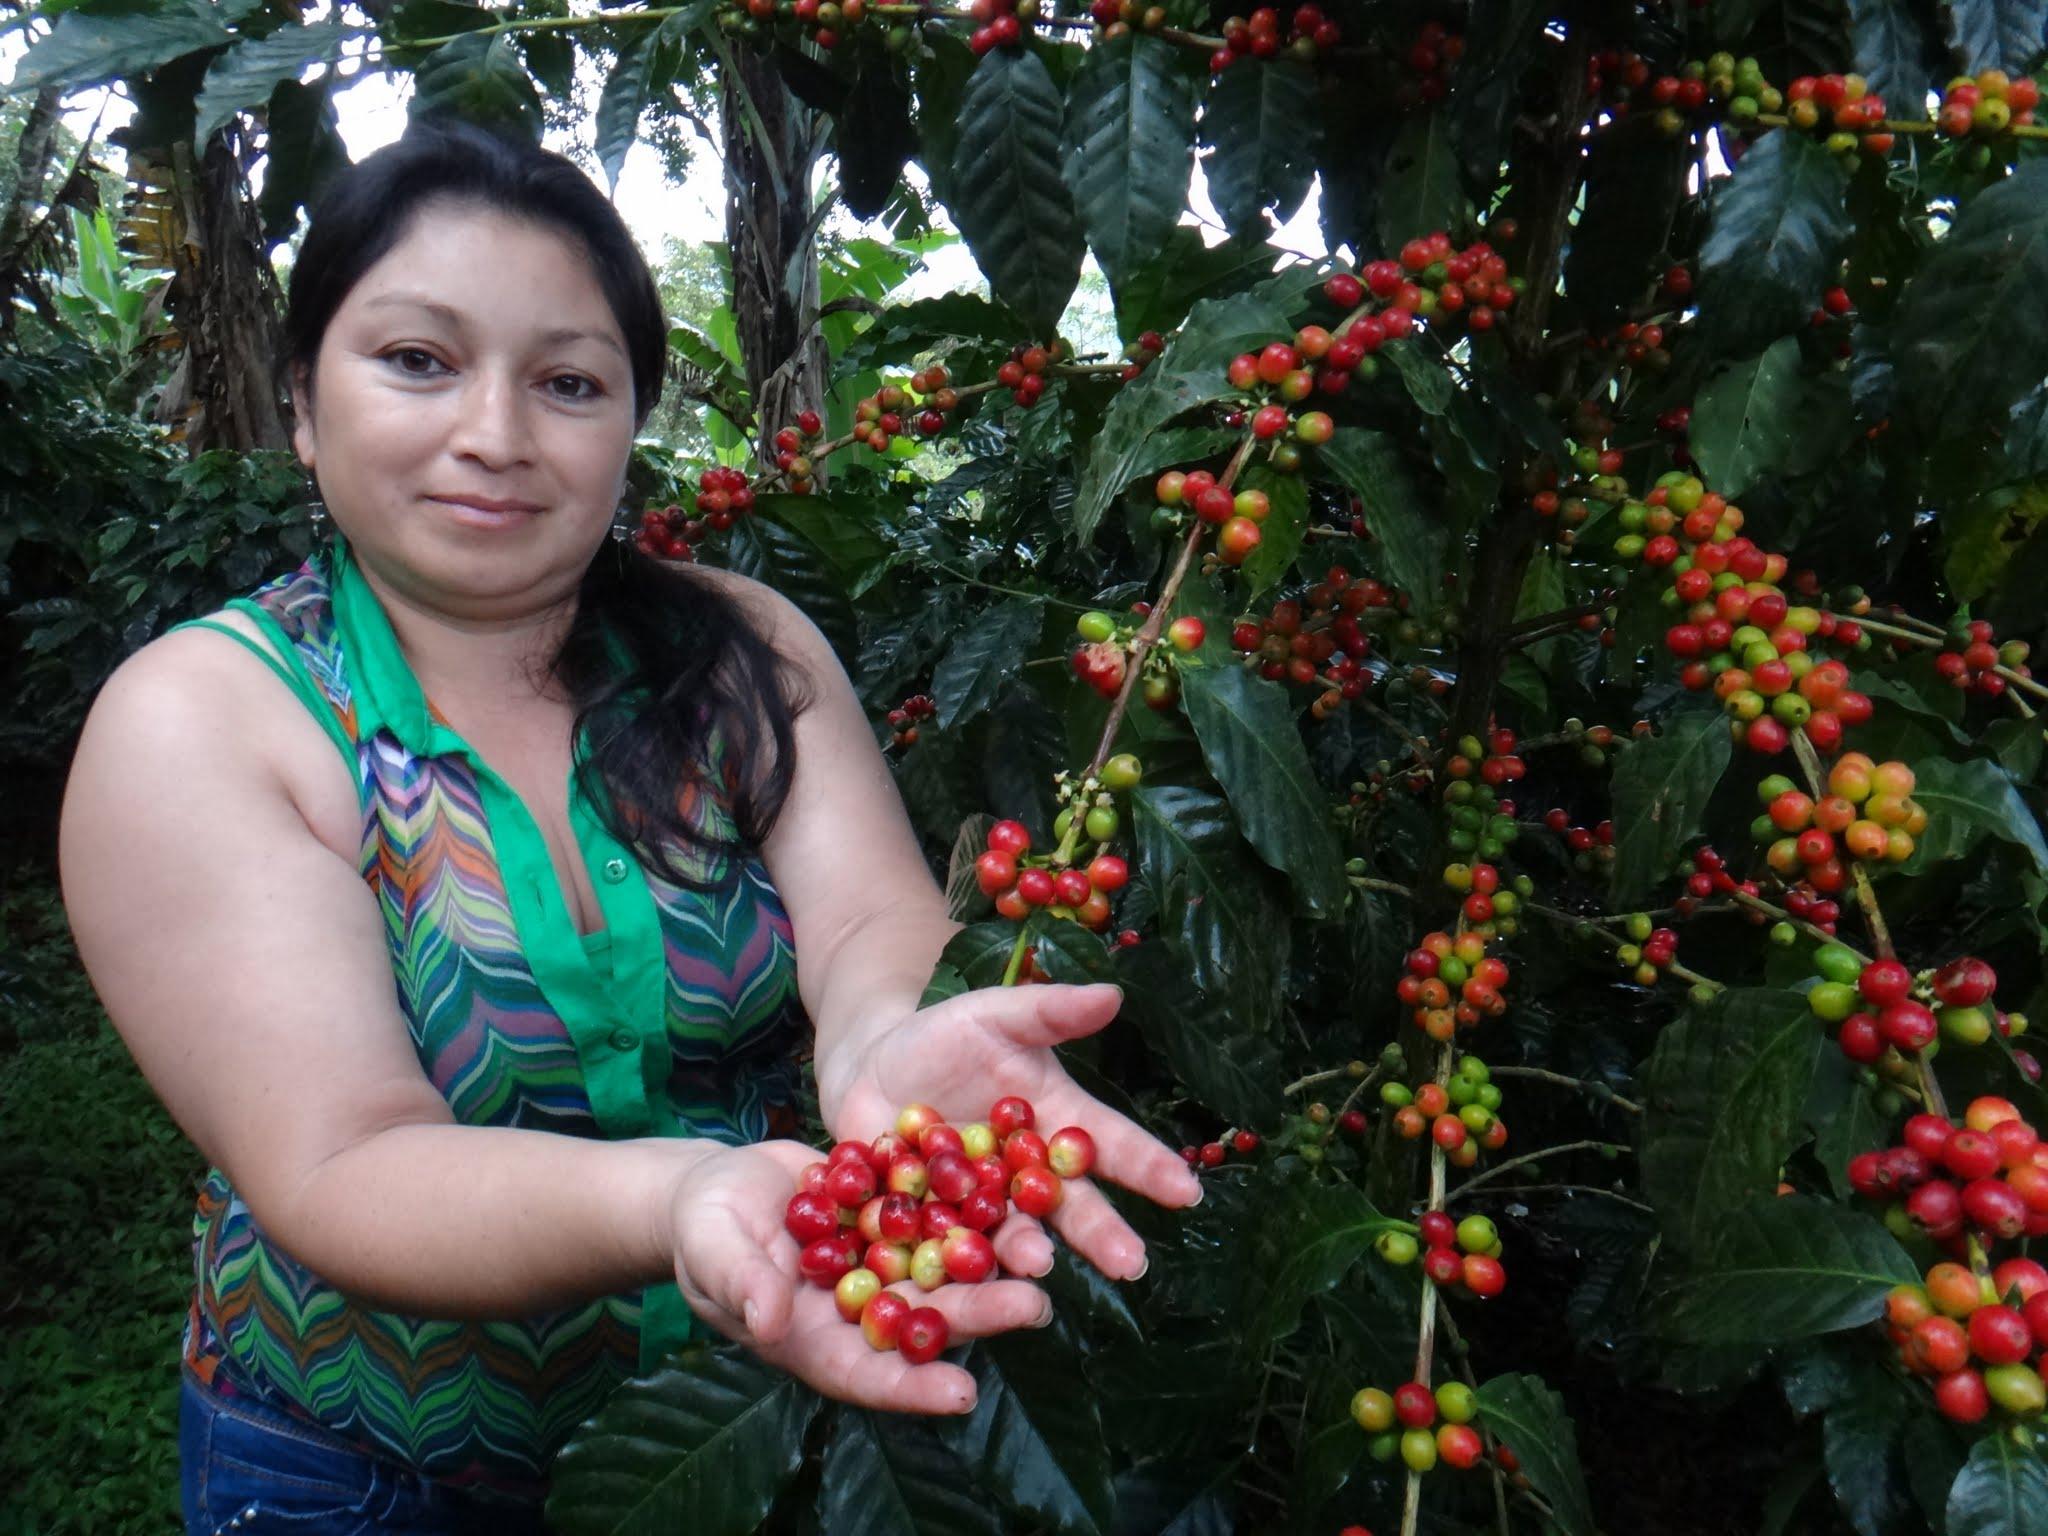 flor-del-pino-honduras-fairtrade-coffee-15